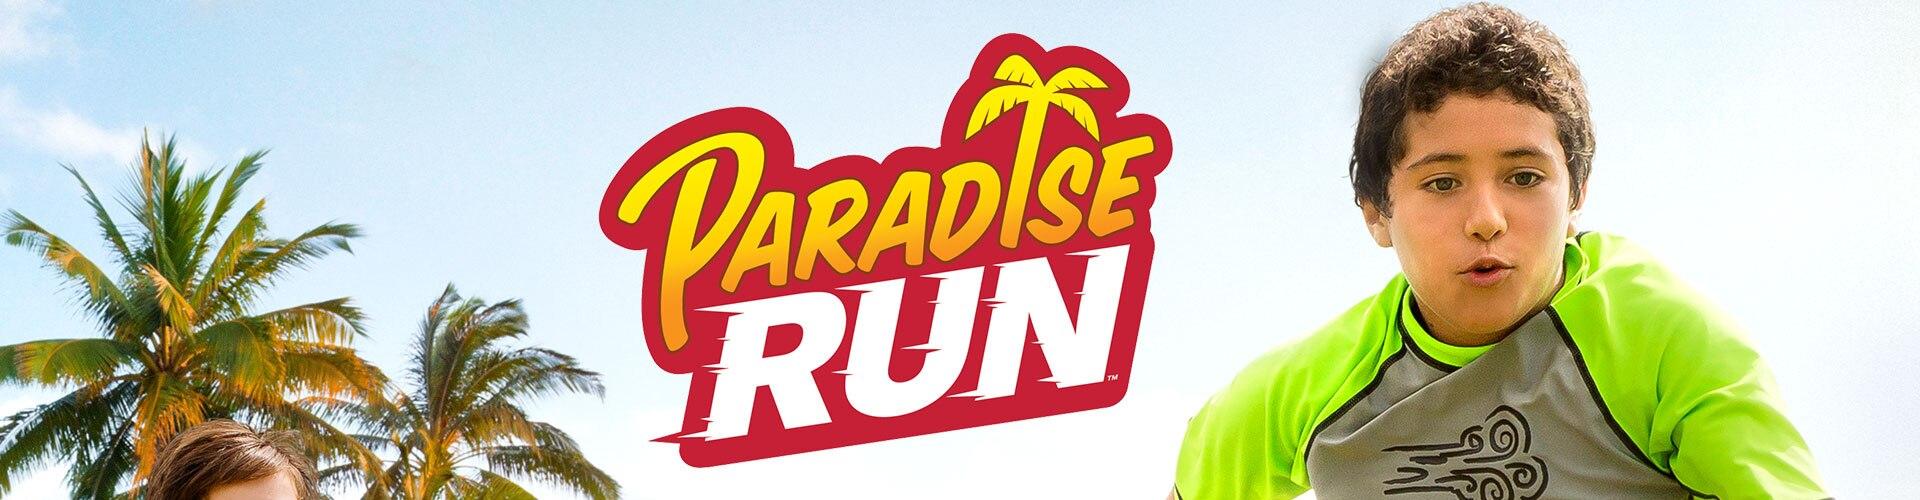 Watch Paradise Run Online